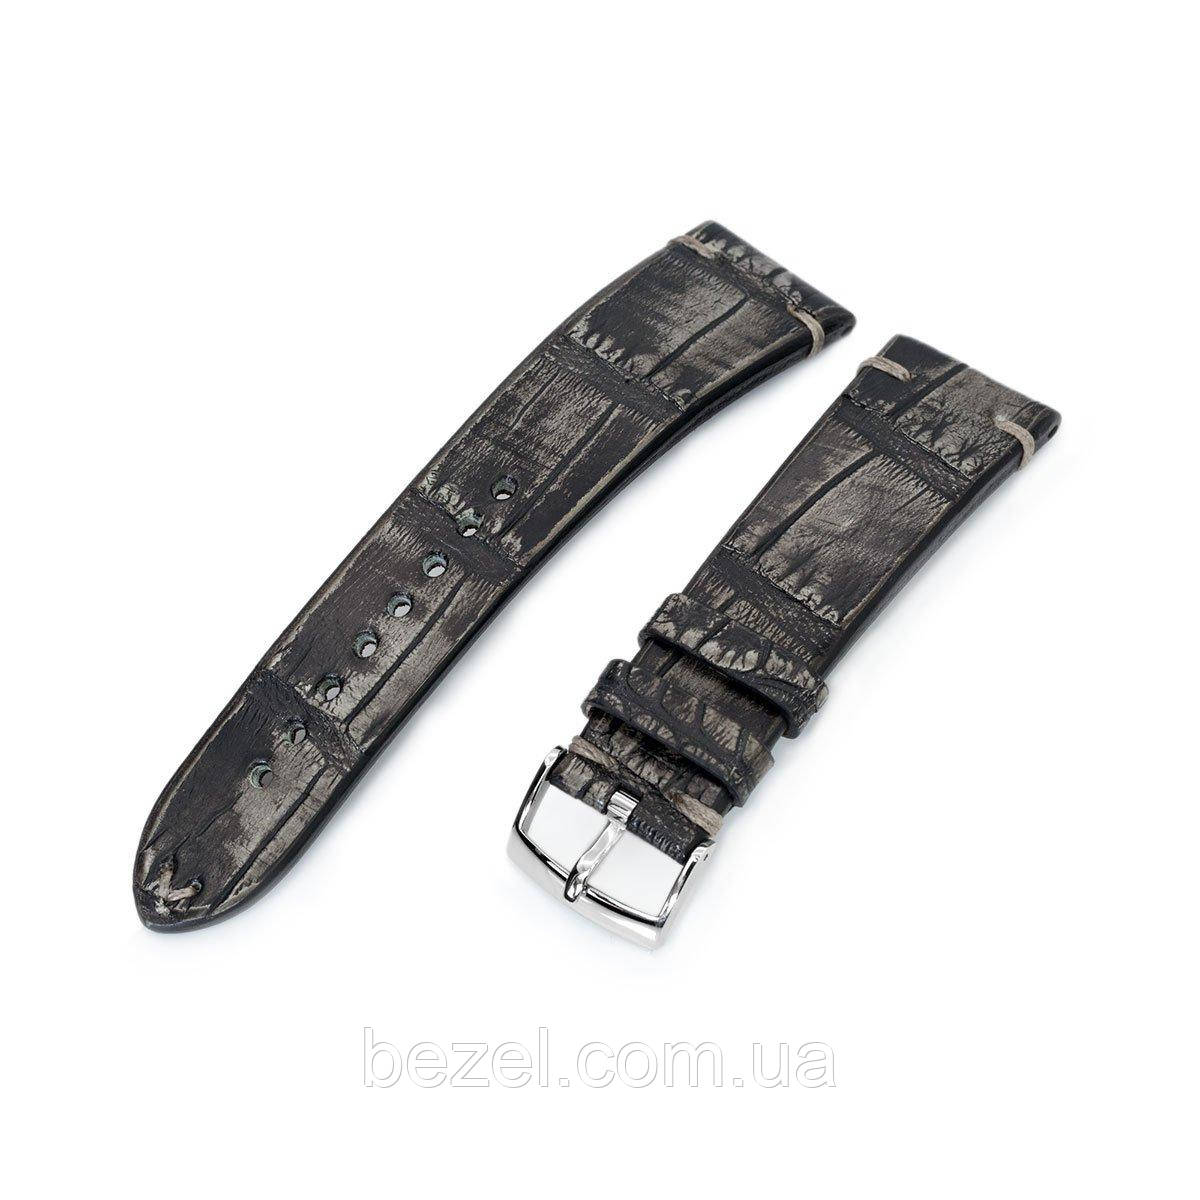 20mm or 22mm MiLTAT Italian Handmade Alligator Belly Vintage Grey Watch Strap